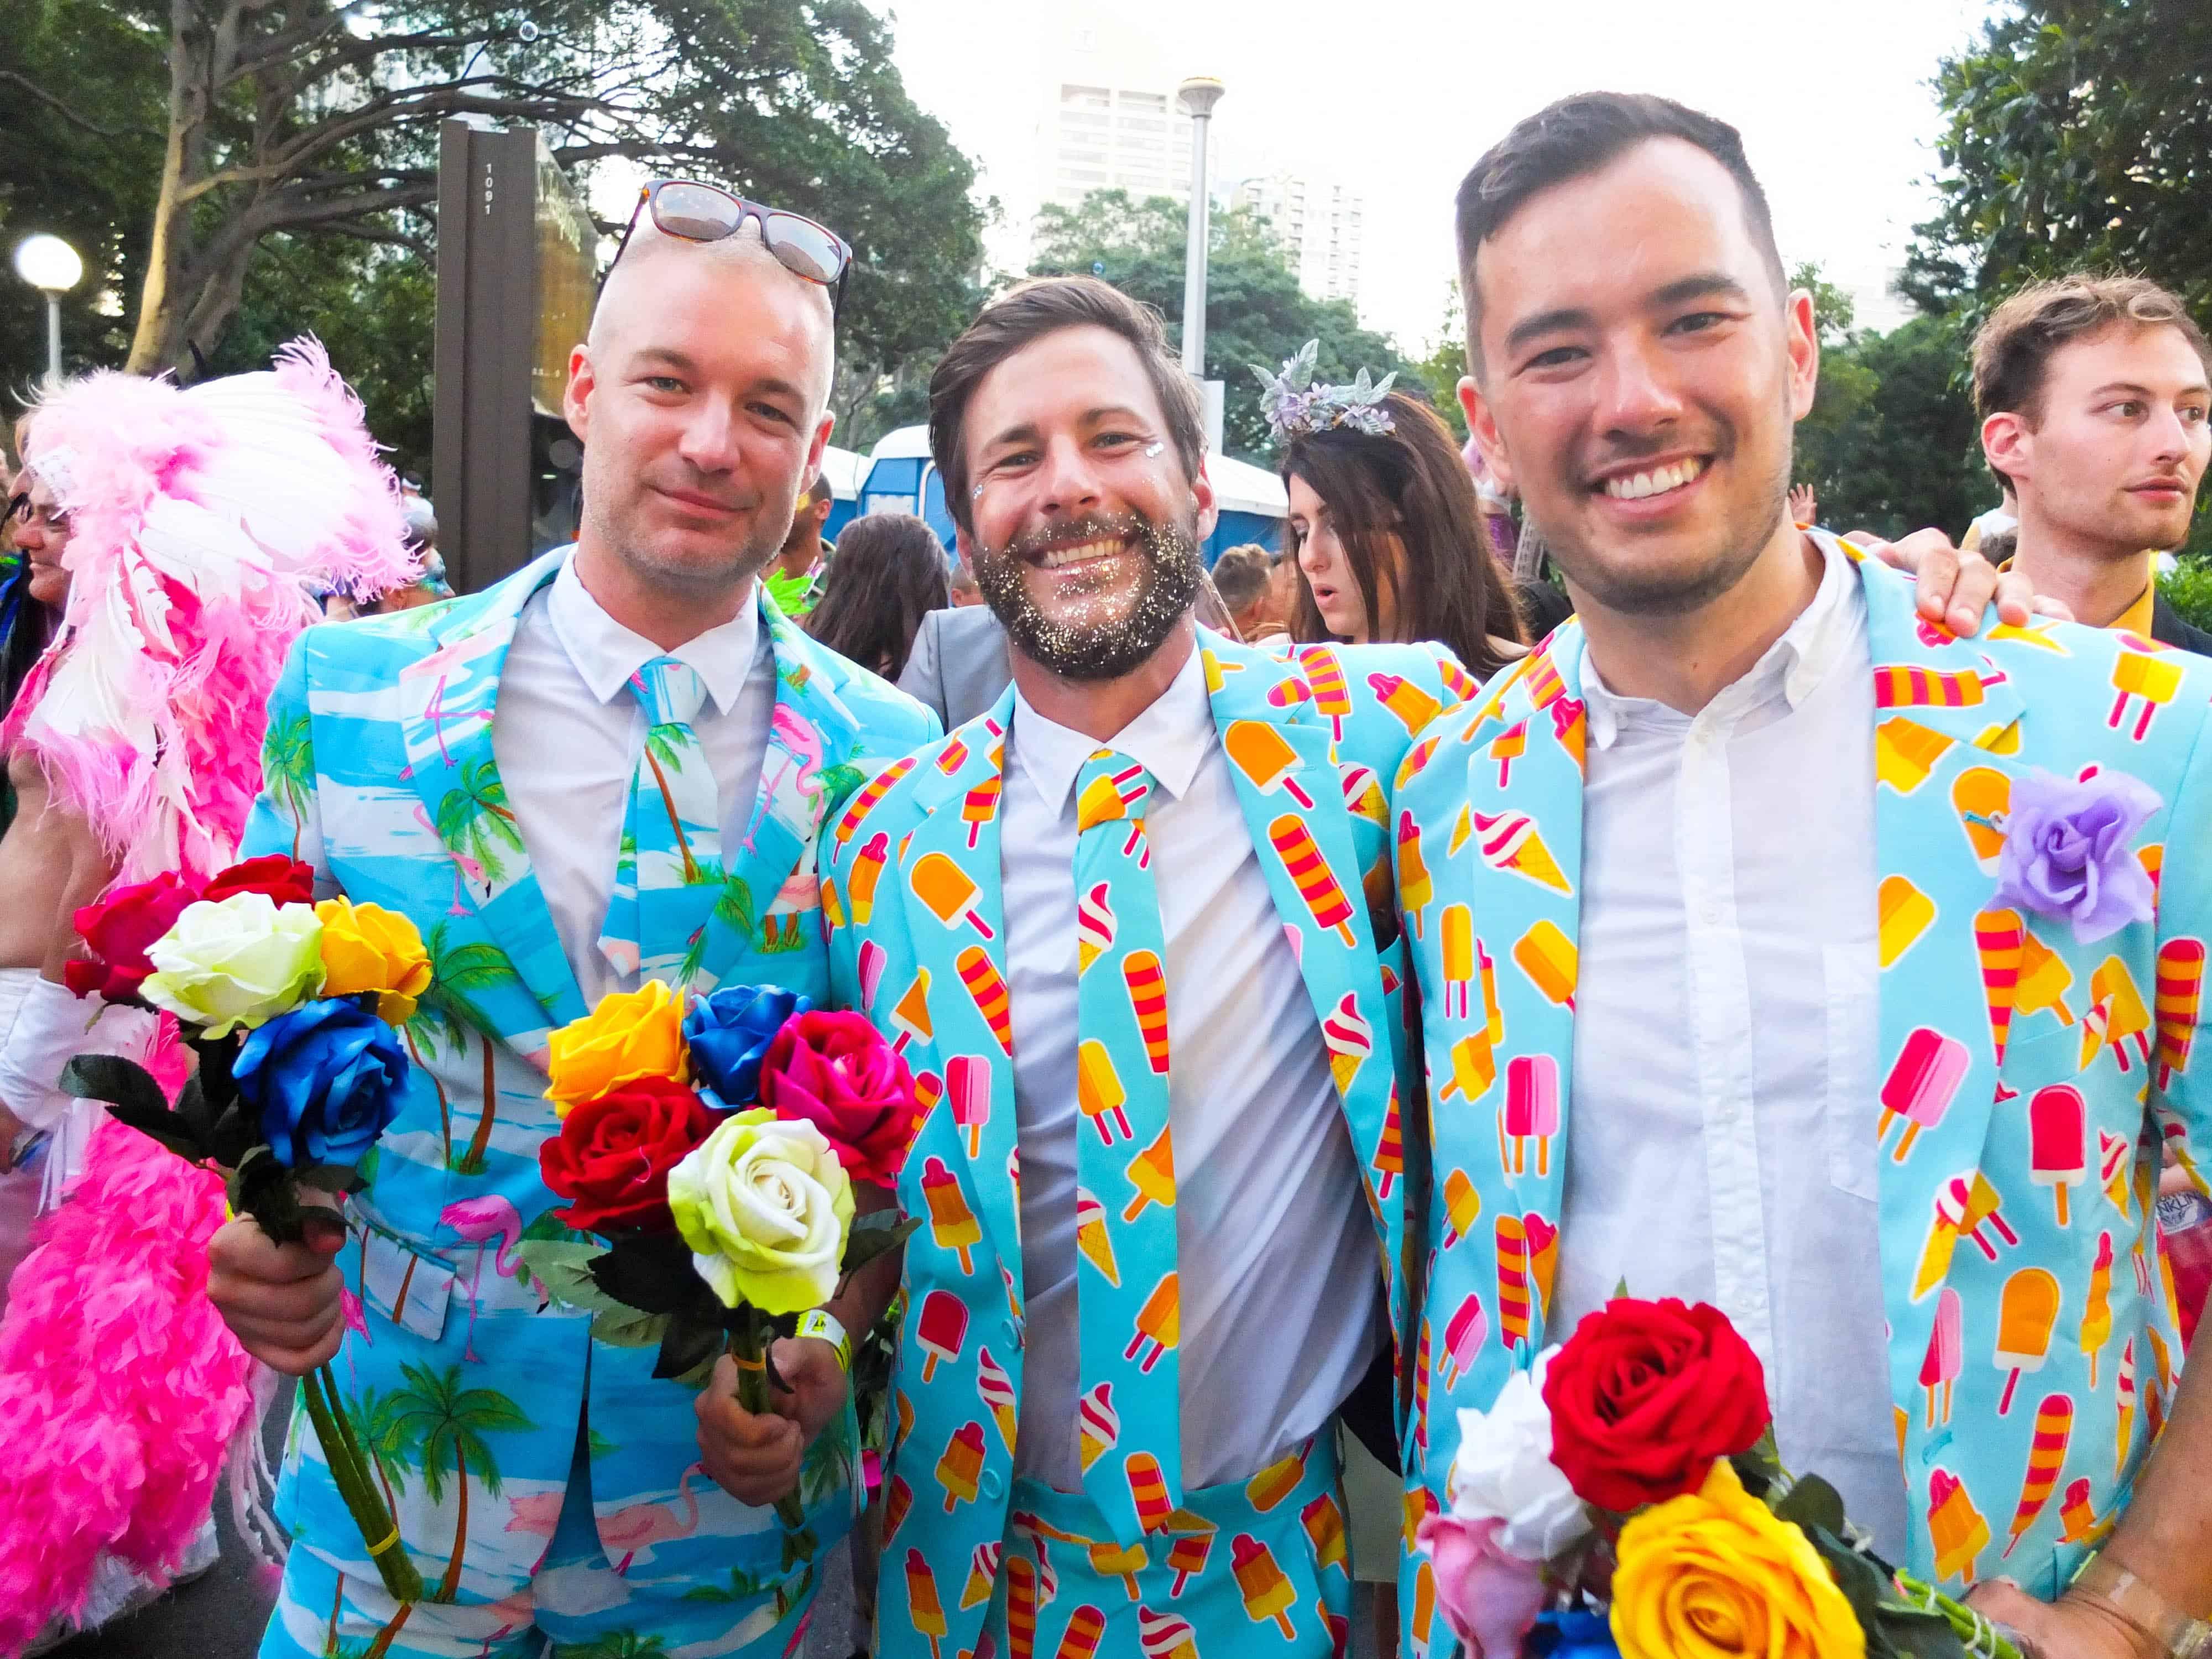 Best pics of Sydney Mardi Gras - Time to Wander